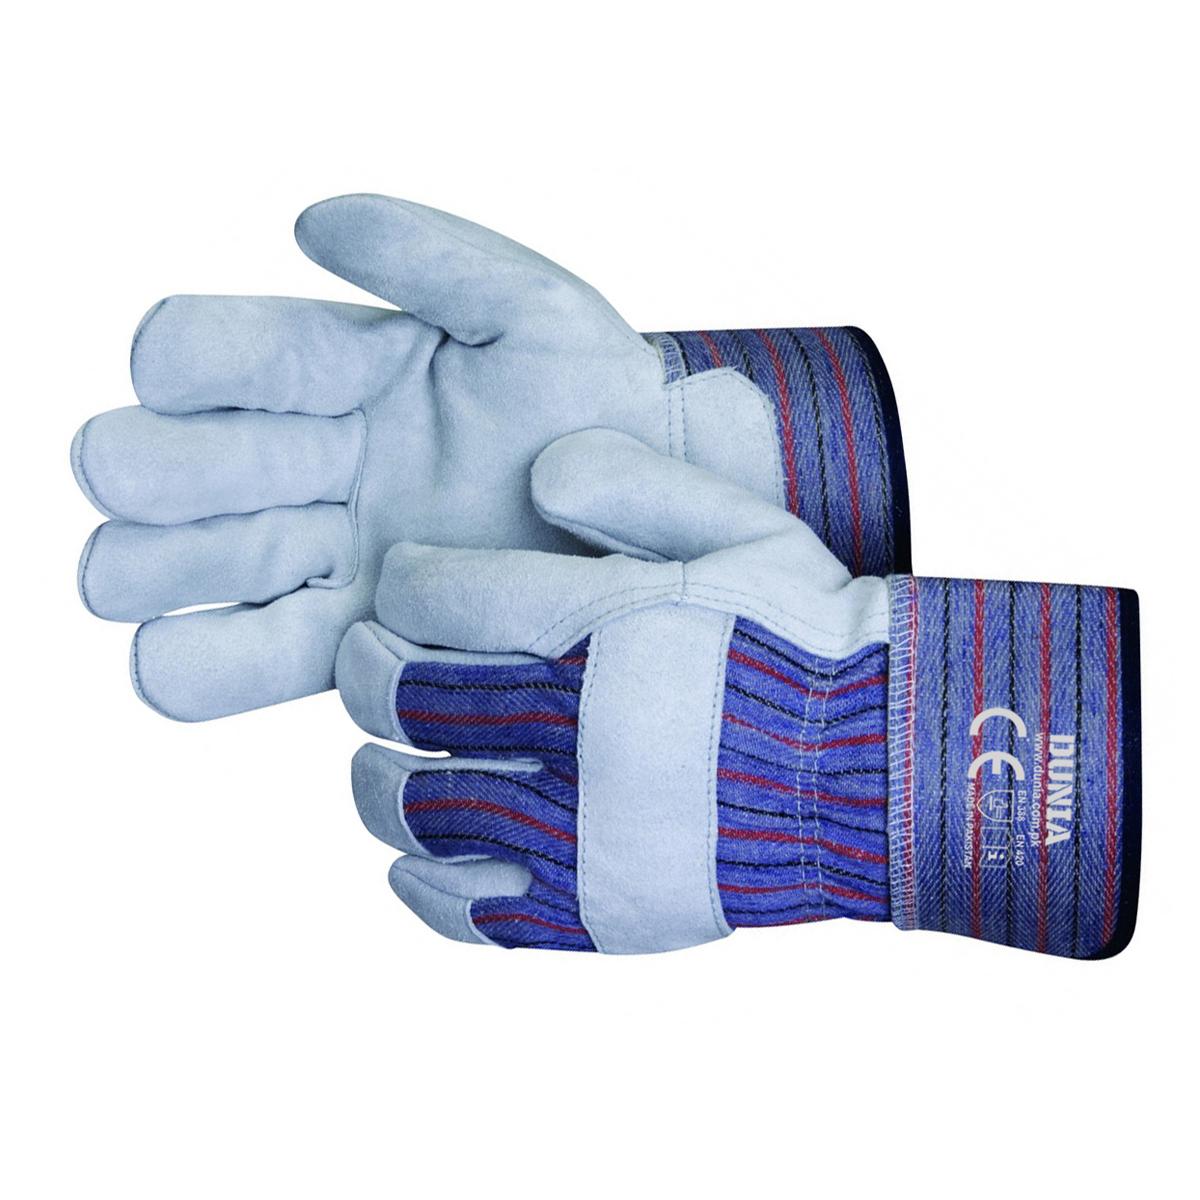 DTC-737 Industrial Work Gloves